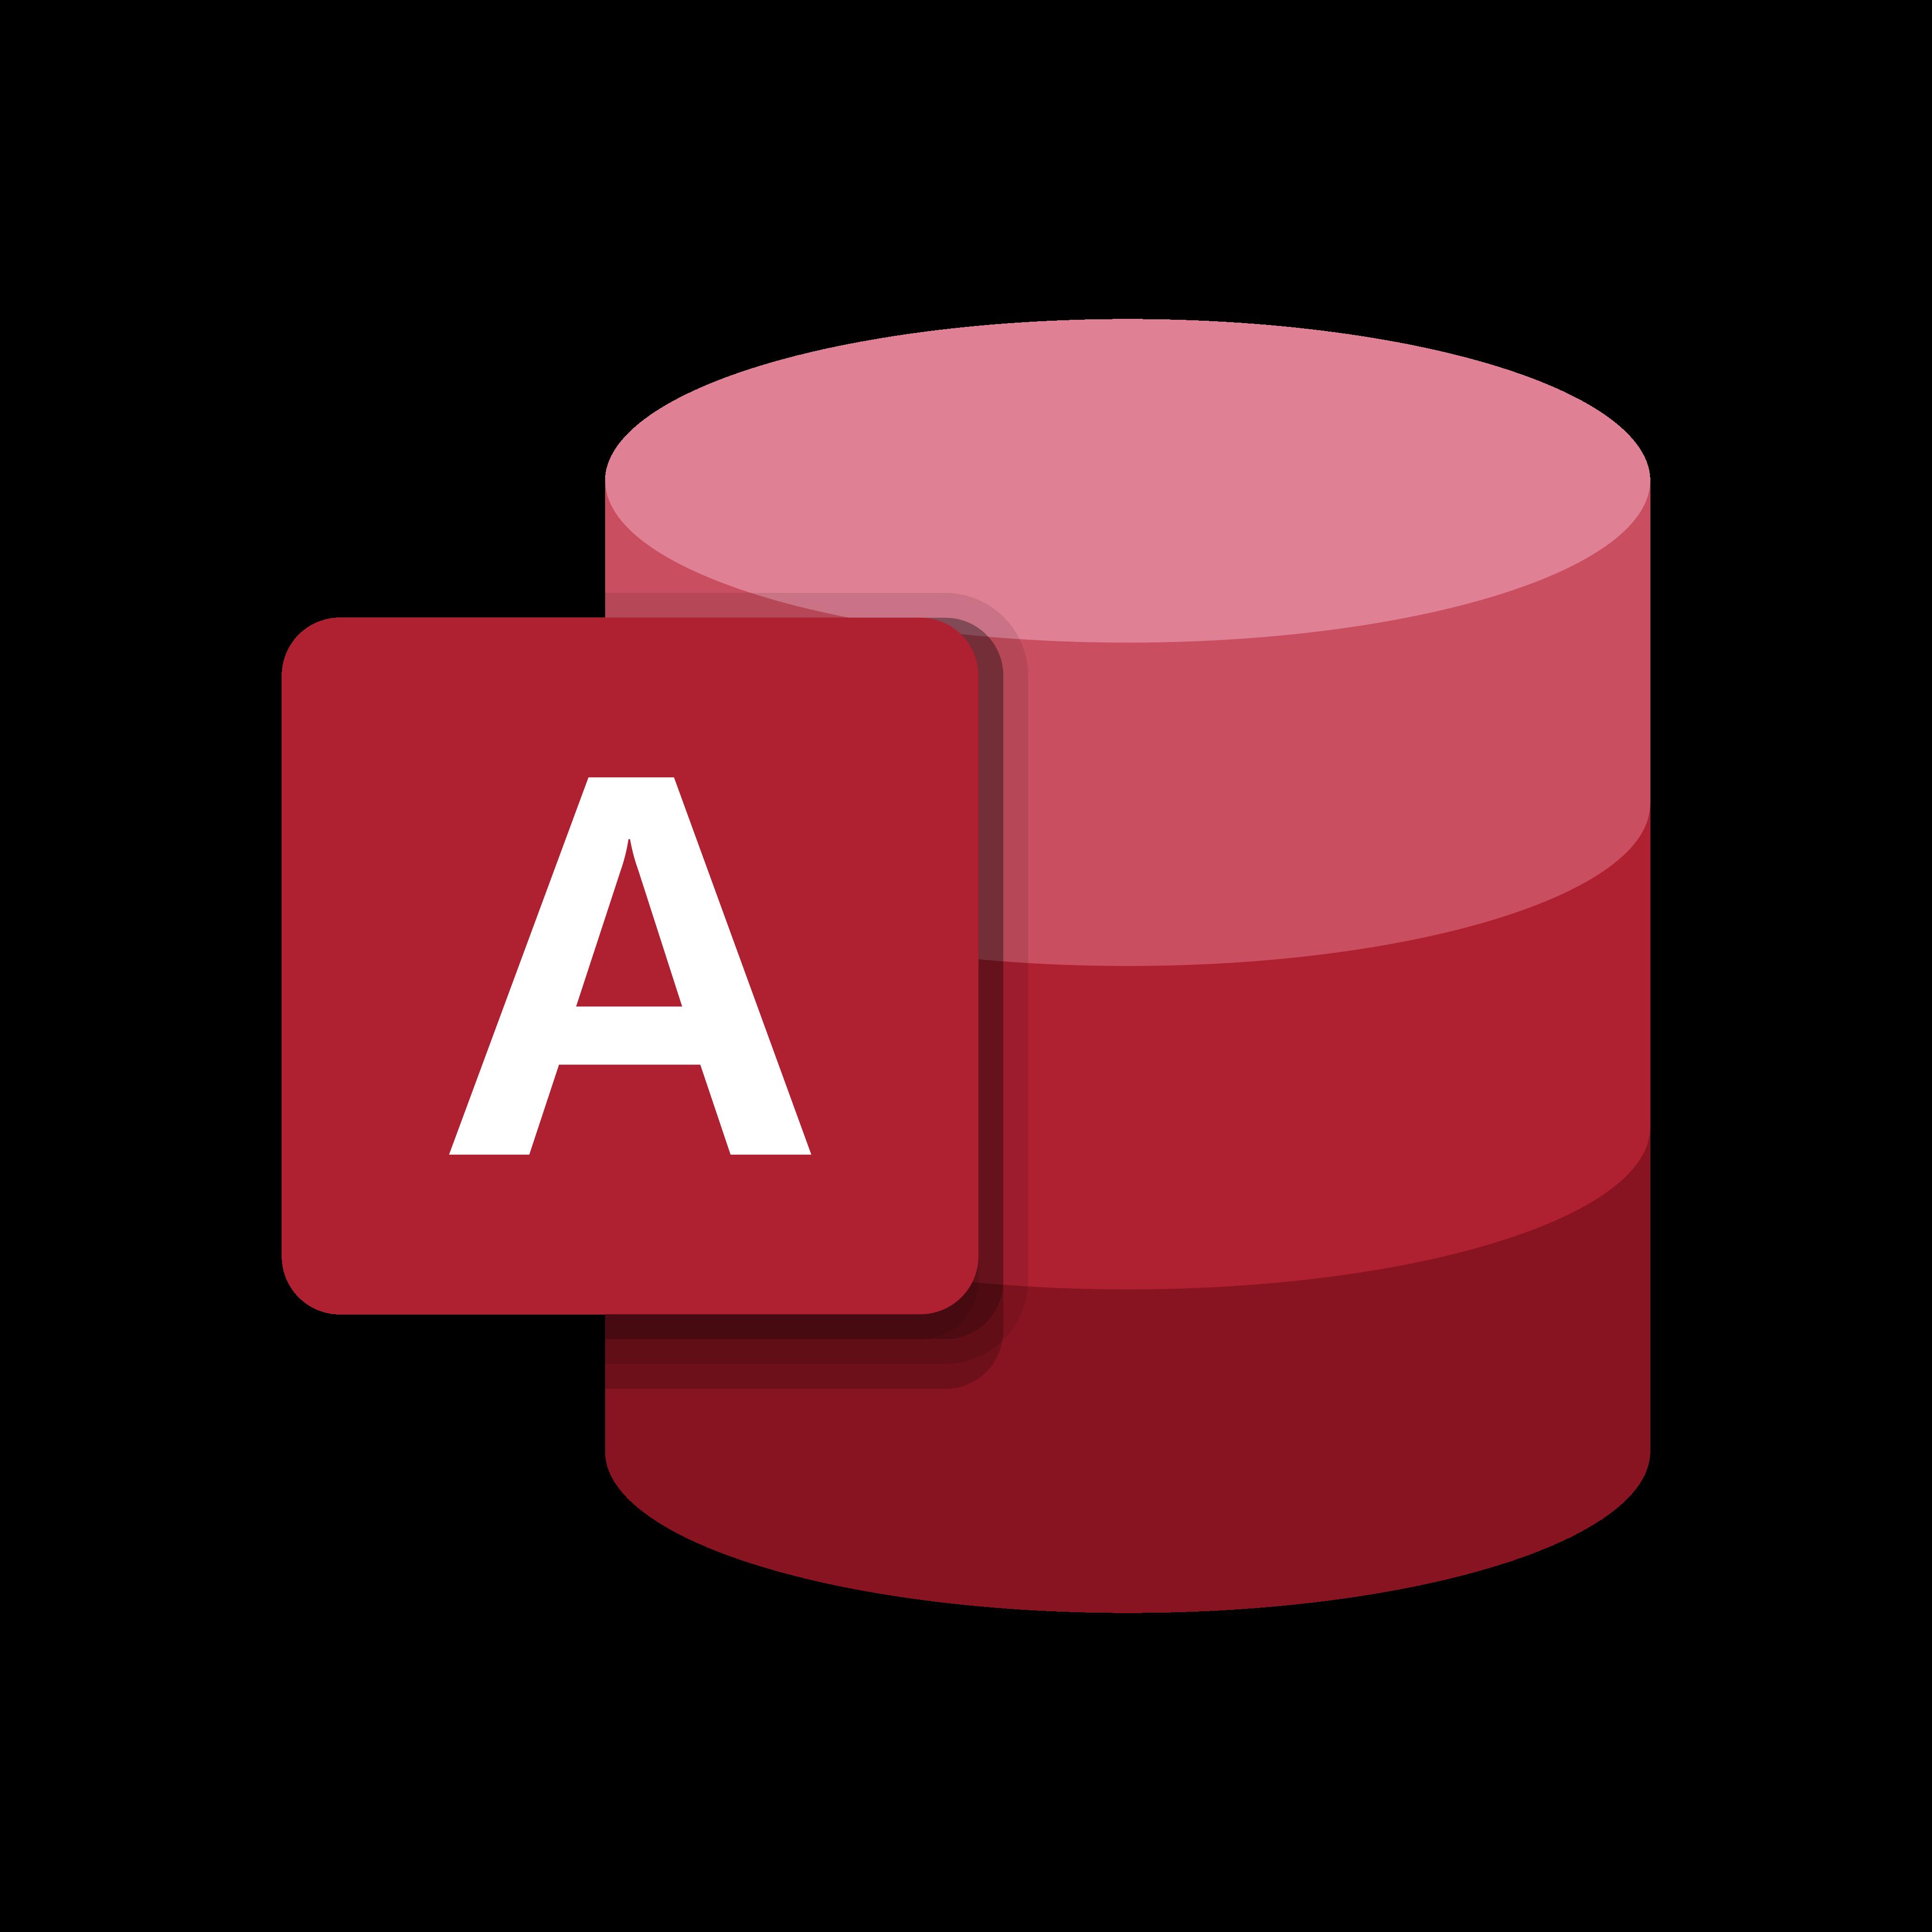 microsoft access logo 0 - Microsoft Access Logo